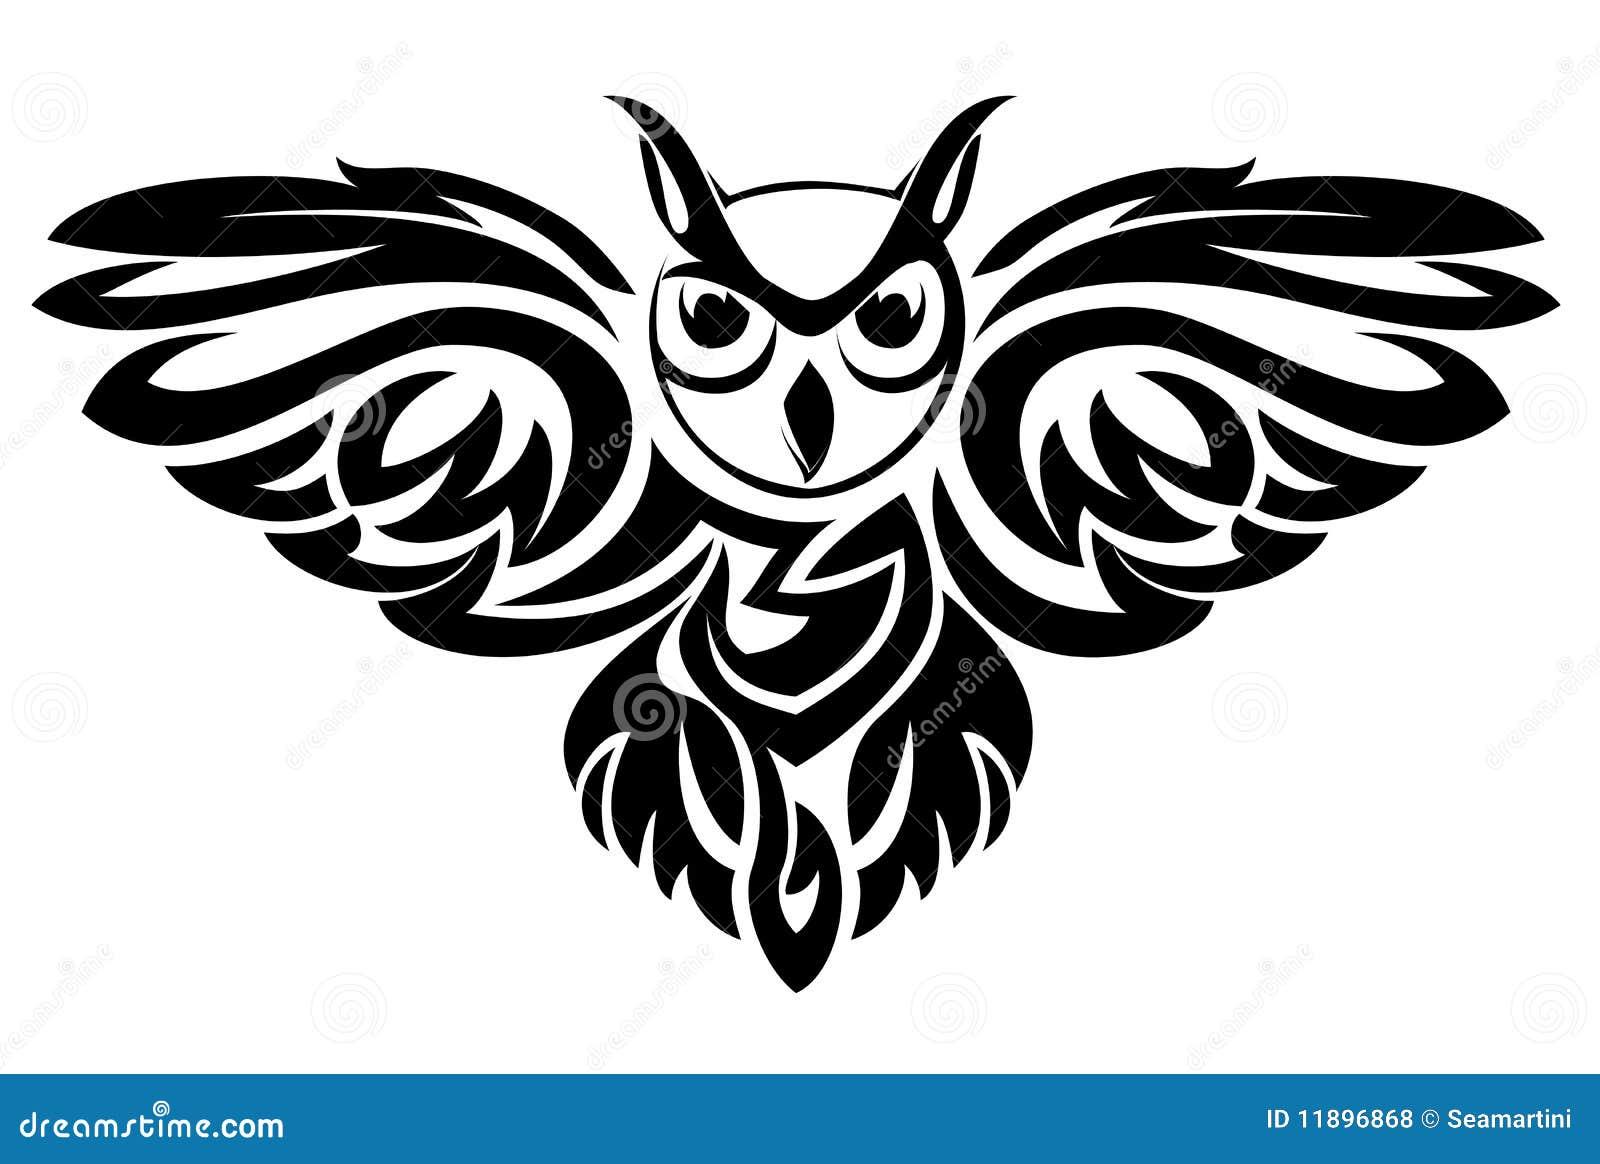 Greek Symbols For Wisdom The Worlds Best Photos Of Blackandwhite